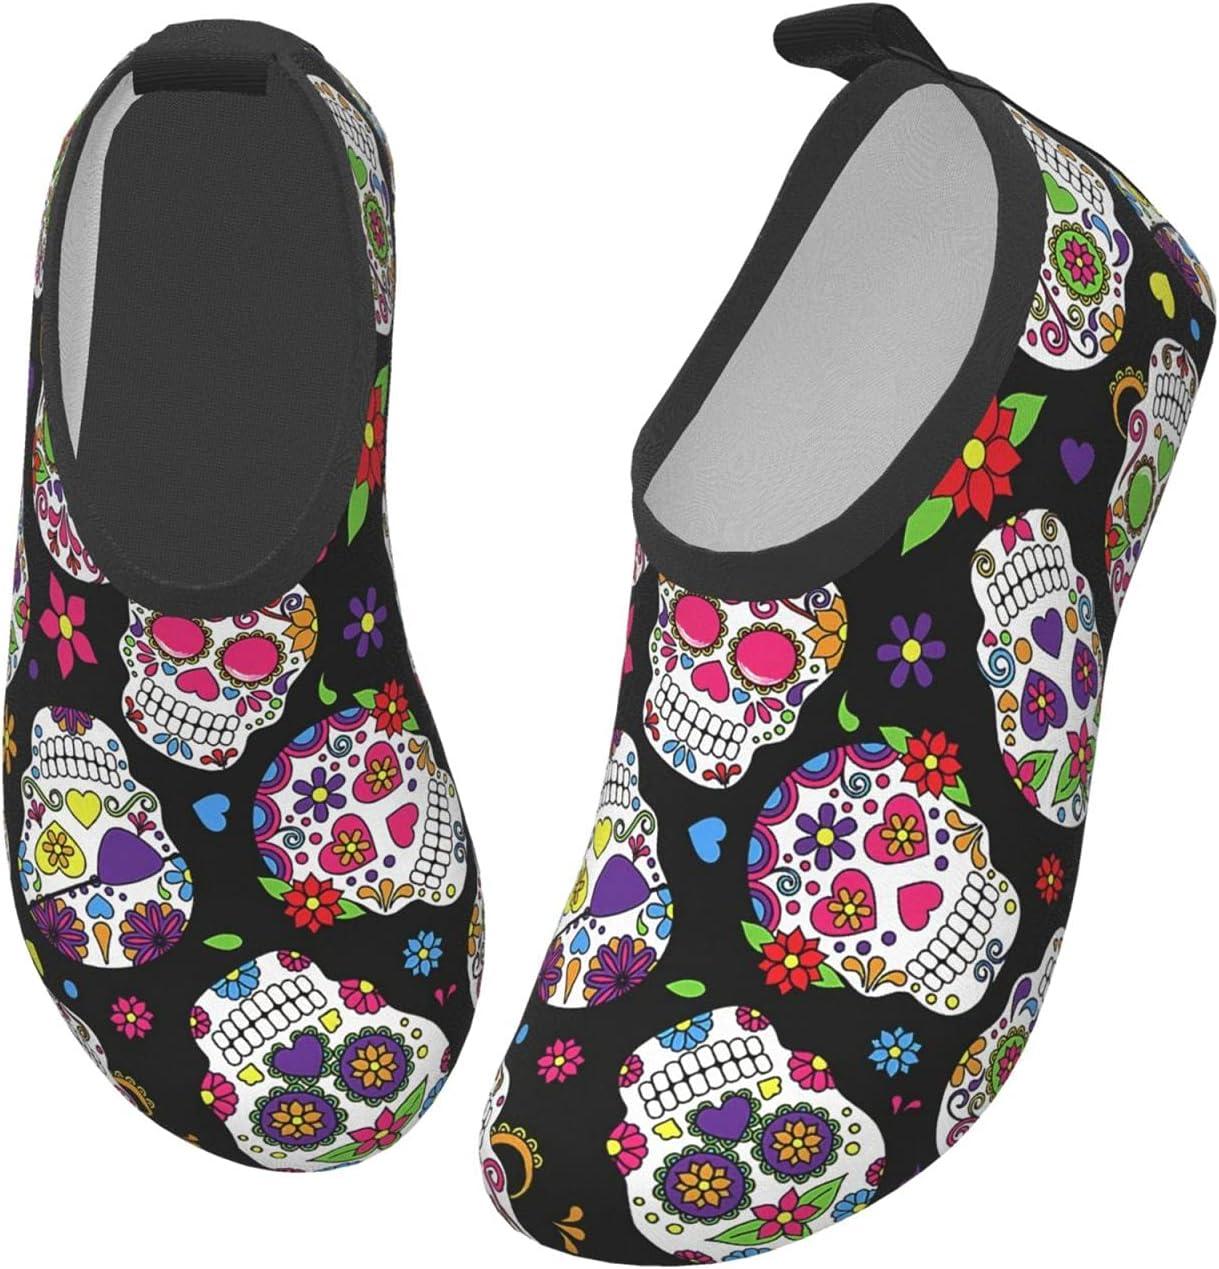 wobzfrok Sugar Skull Kids Water Shoes Girls Boys Toddler Non-Slip Quick Dry Aqua Socks for Beach Swim Walking 28/29